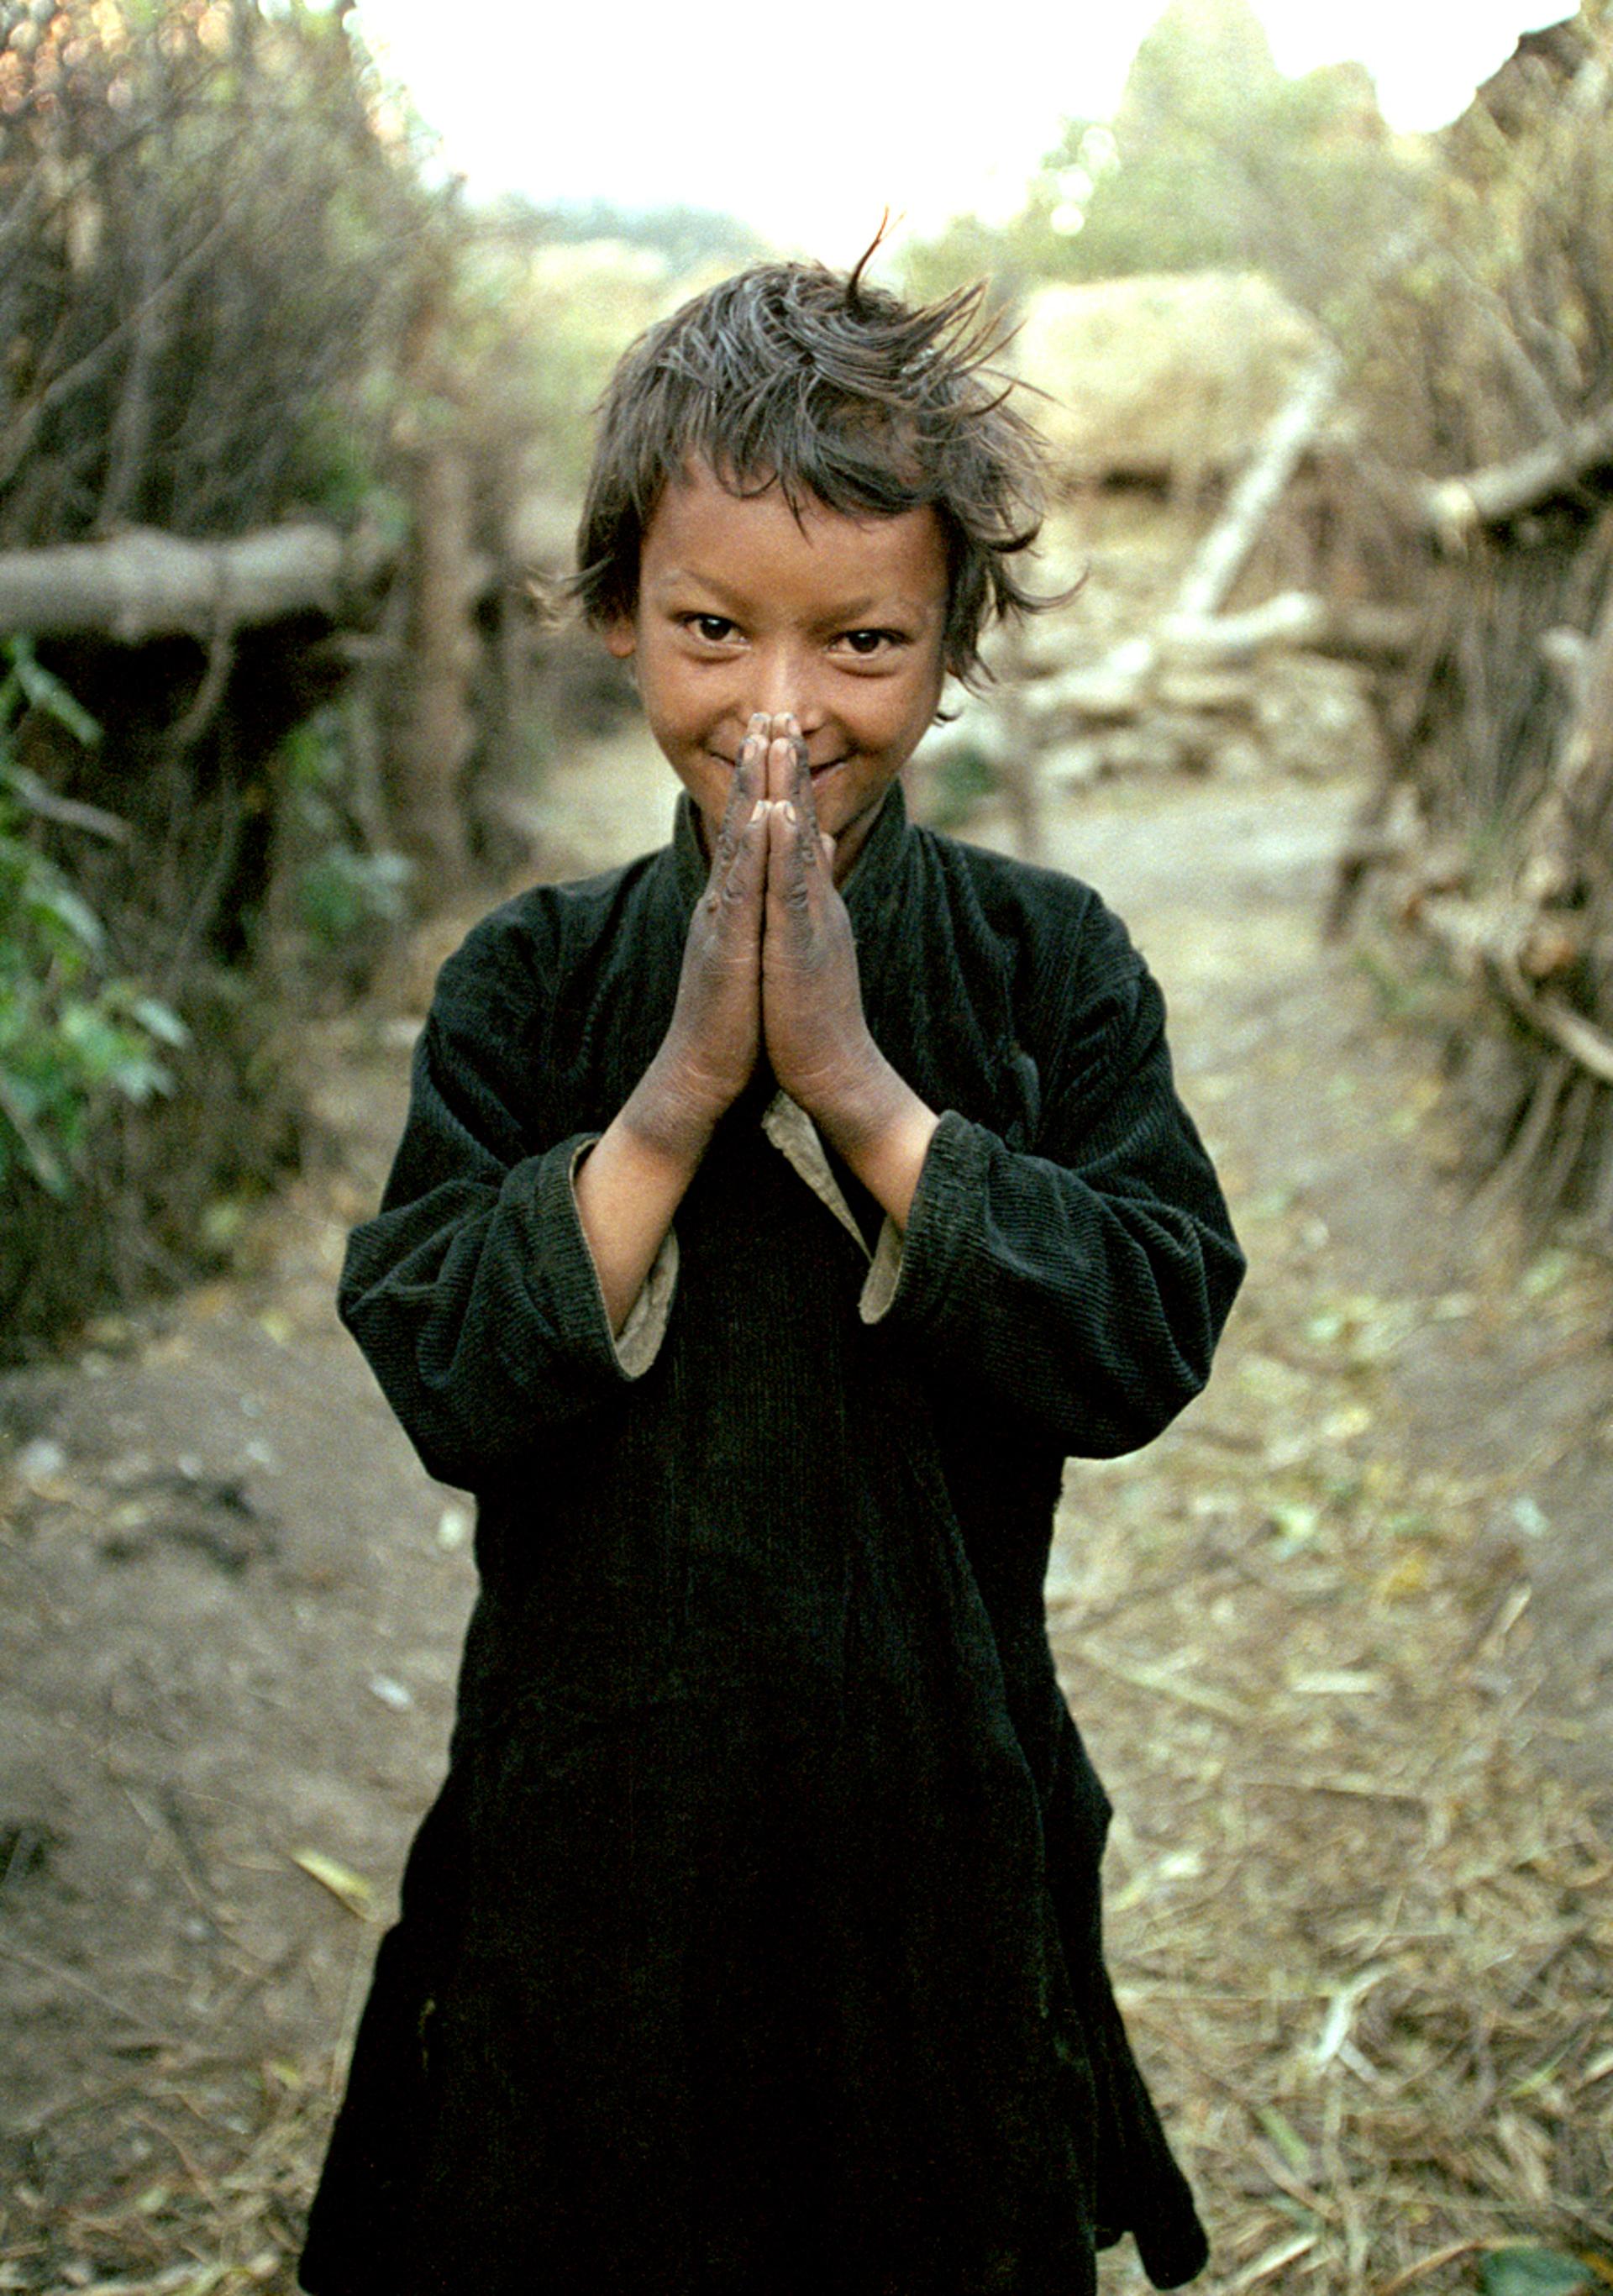 Namaste, Simikot, Humla region, Nepal by Cora Edmonds